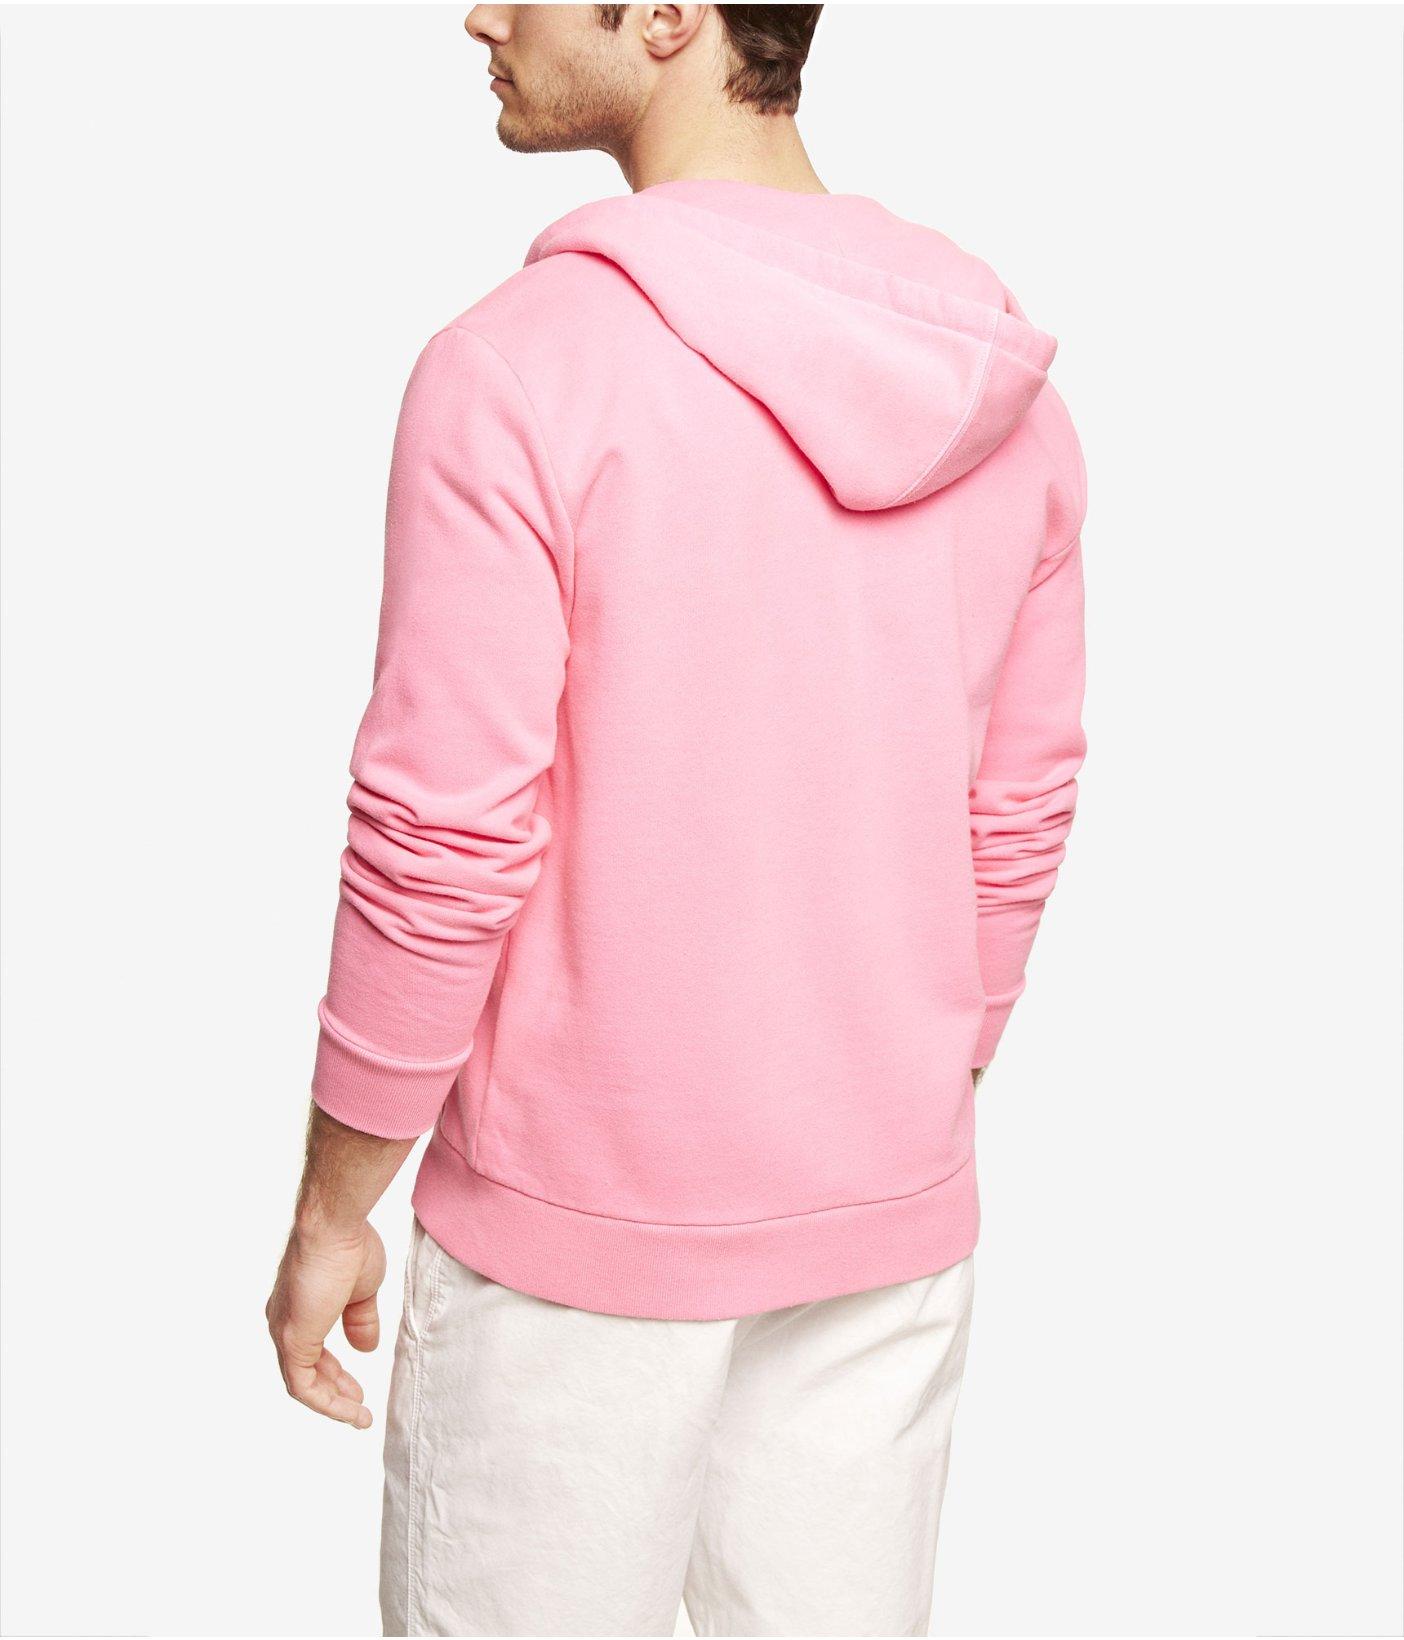 Mens Pink Zip Up Hoodie Photo Album - Reikian